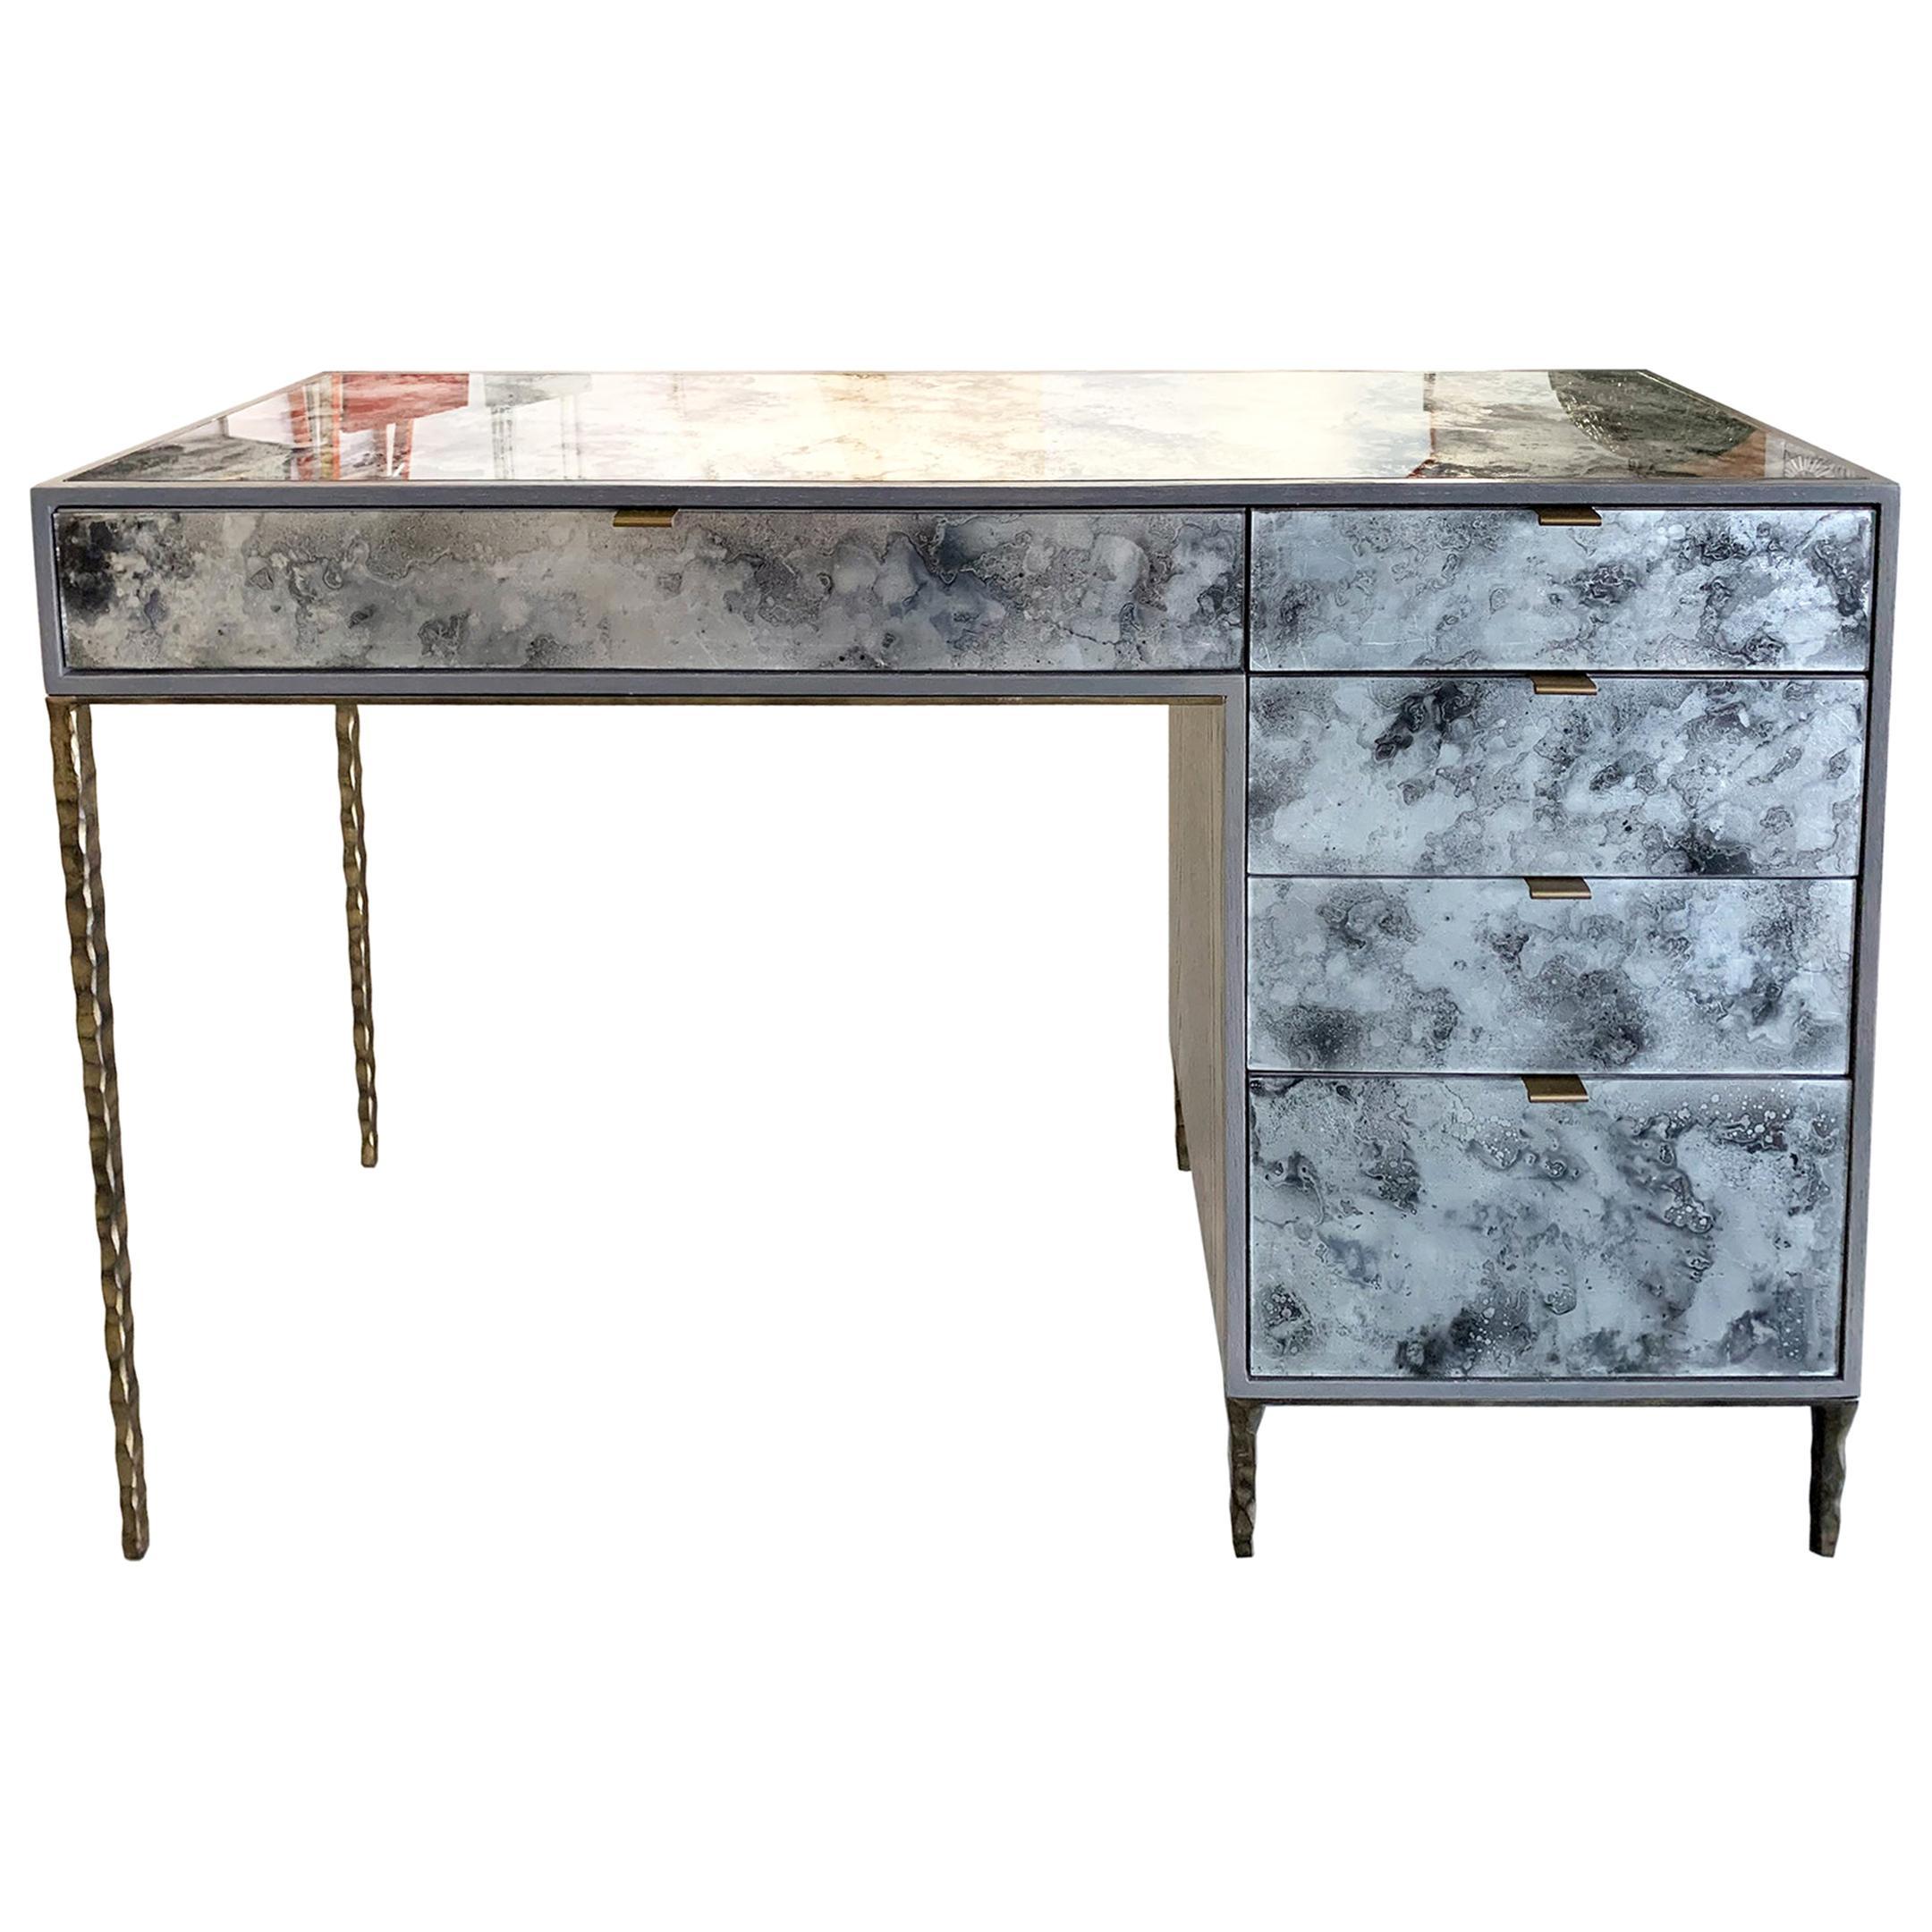 Customizable Contemporary Églomisé Glass Fume Silver Vanity/Desk by Ercole Home